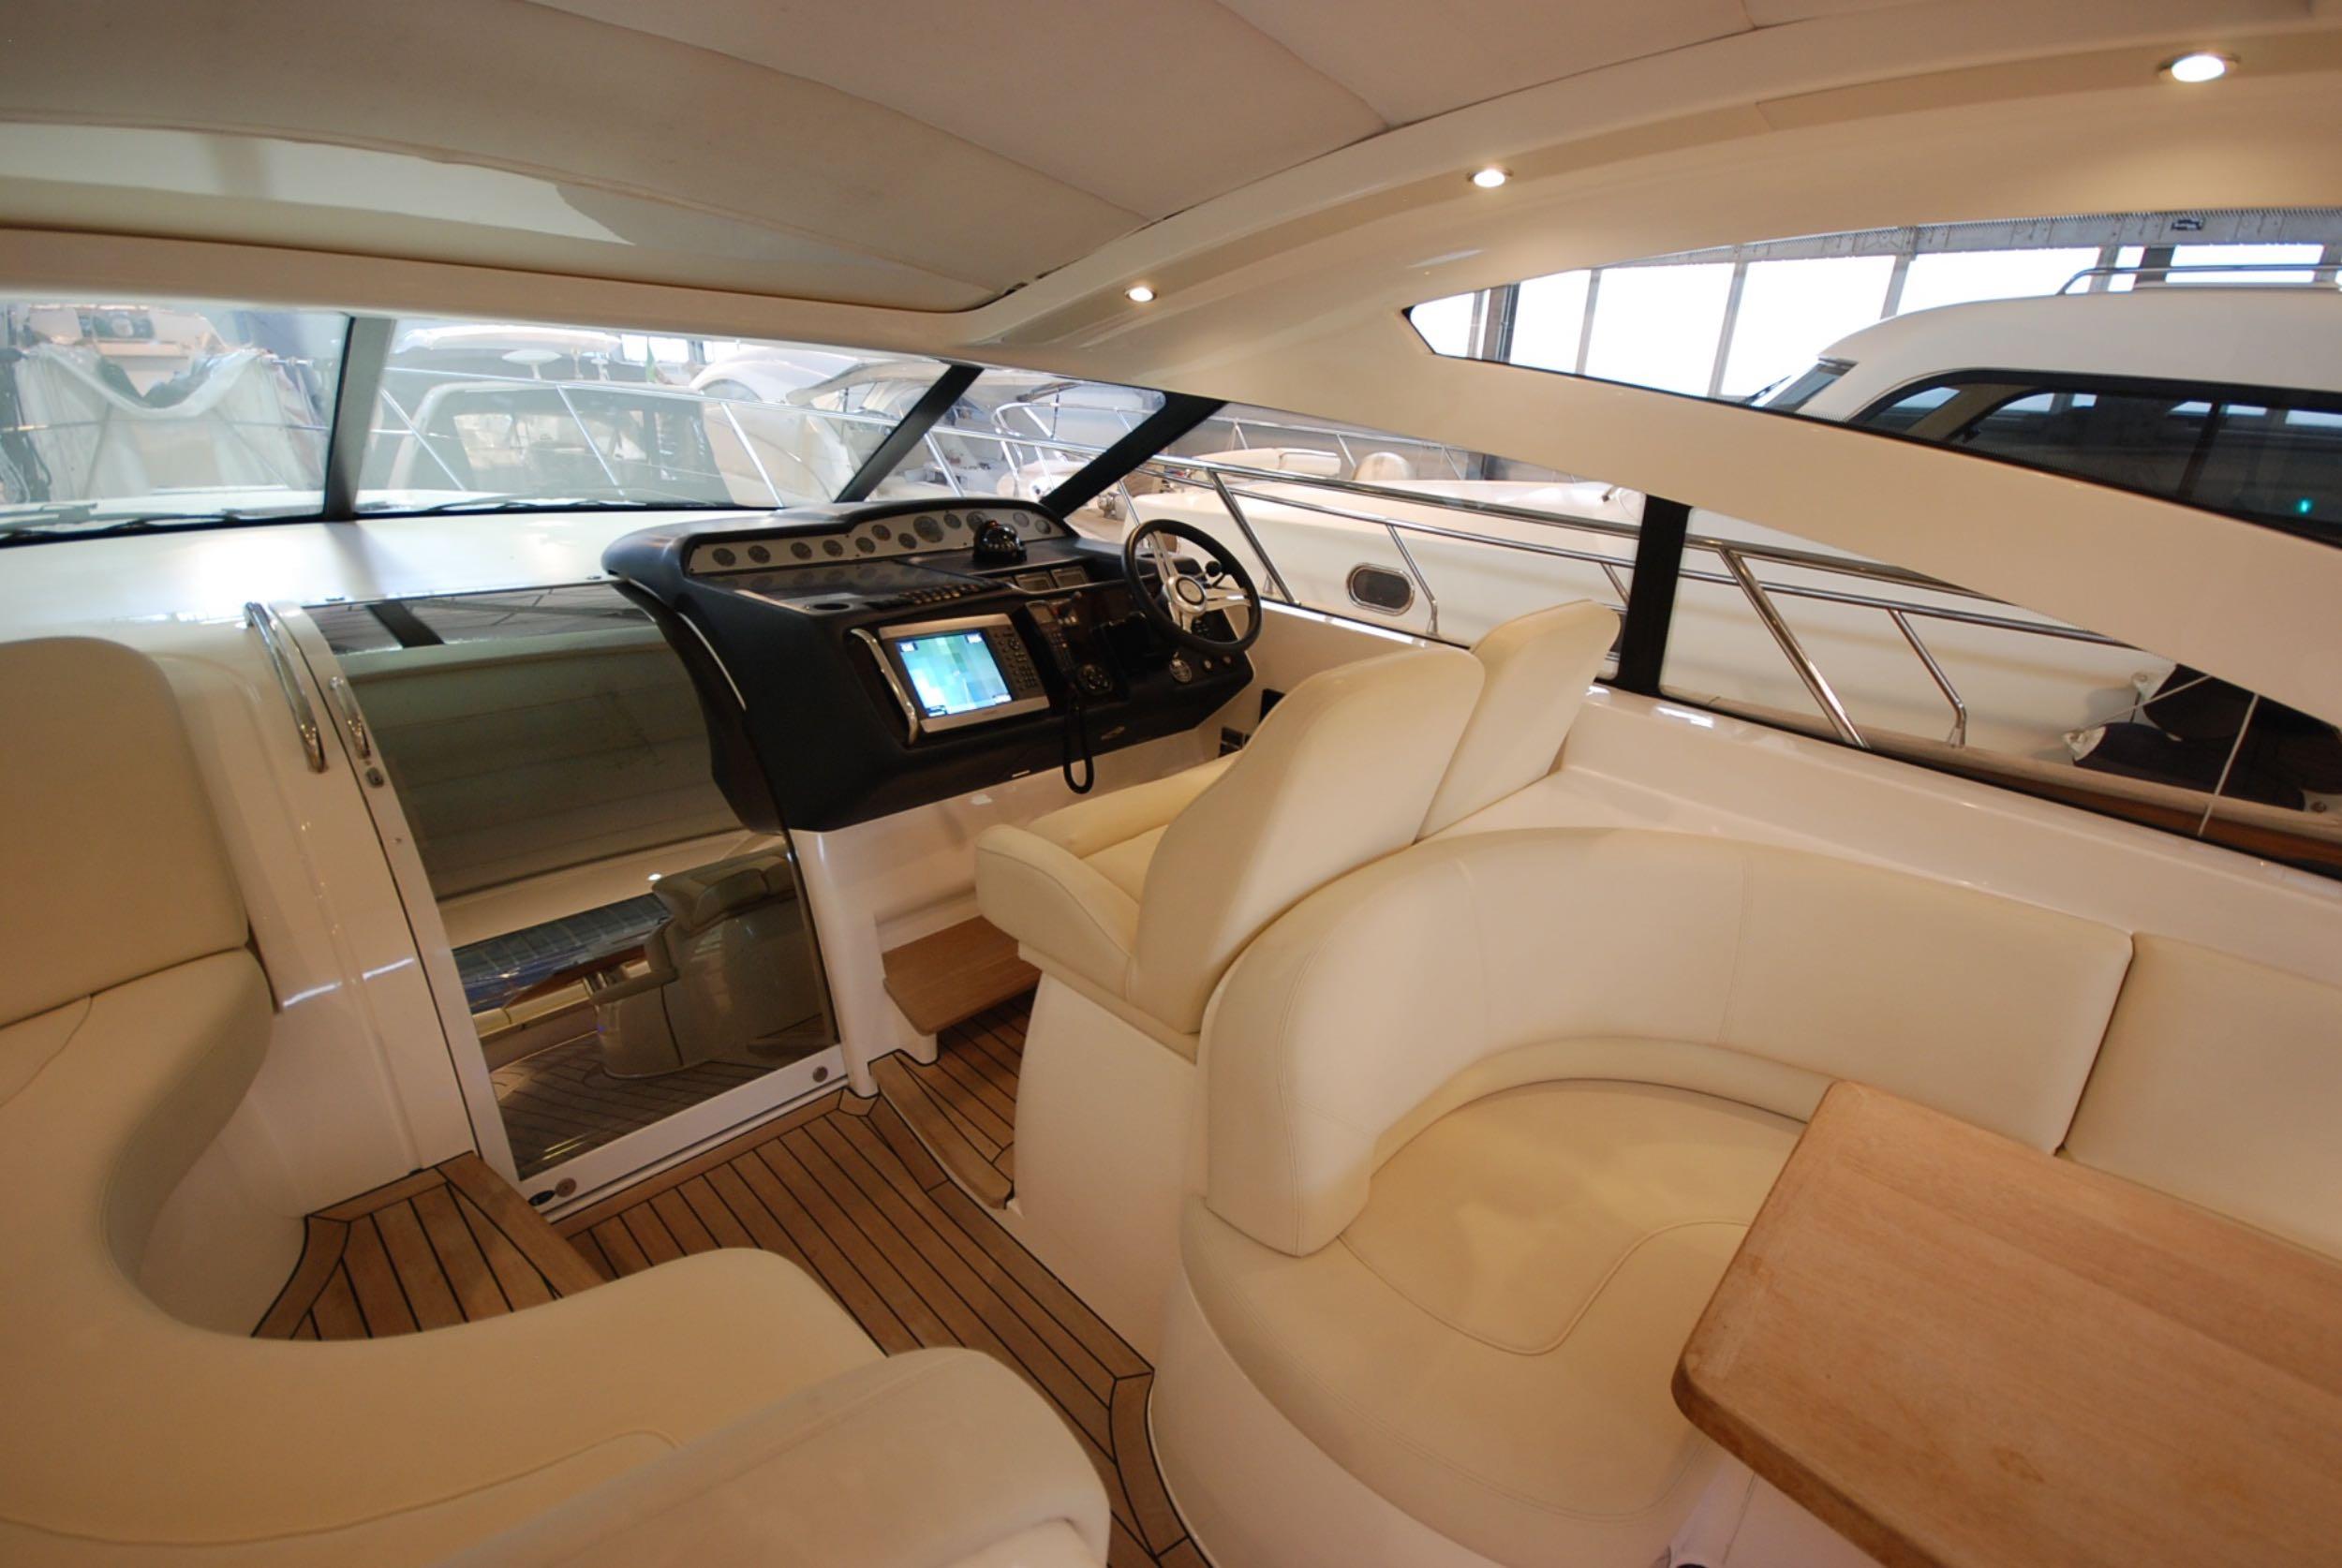 princess-yachts-v58-maestro-di-vita-for-sale-8.jpg